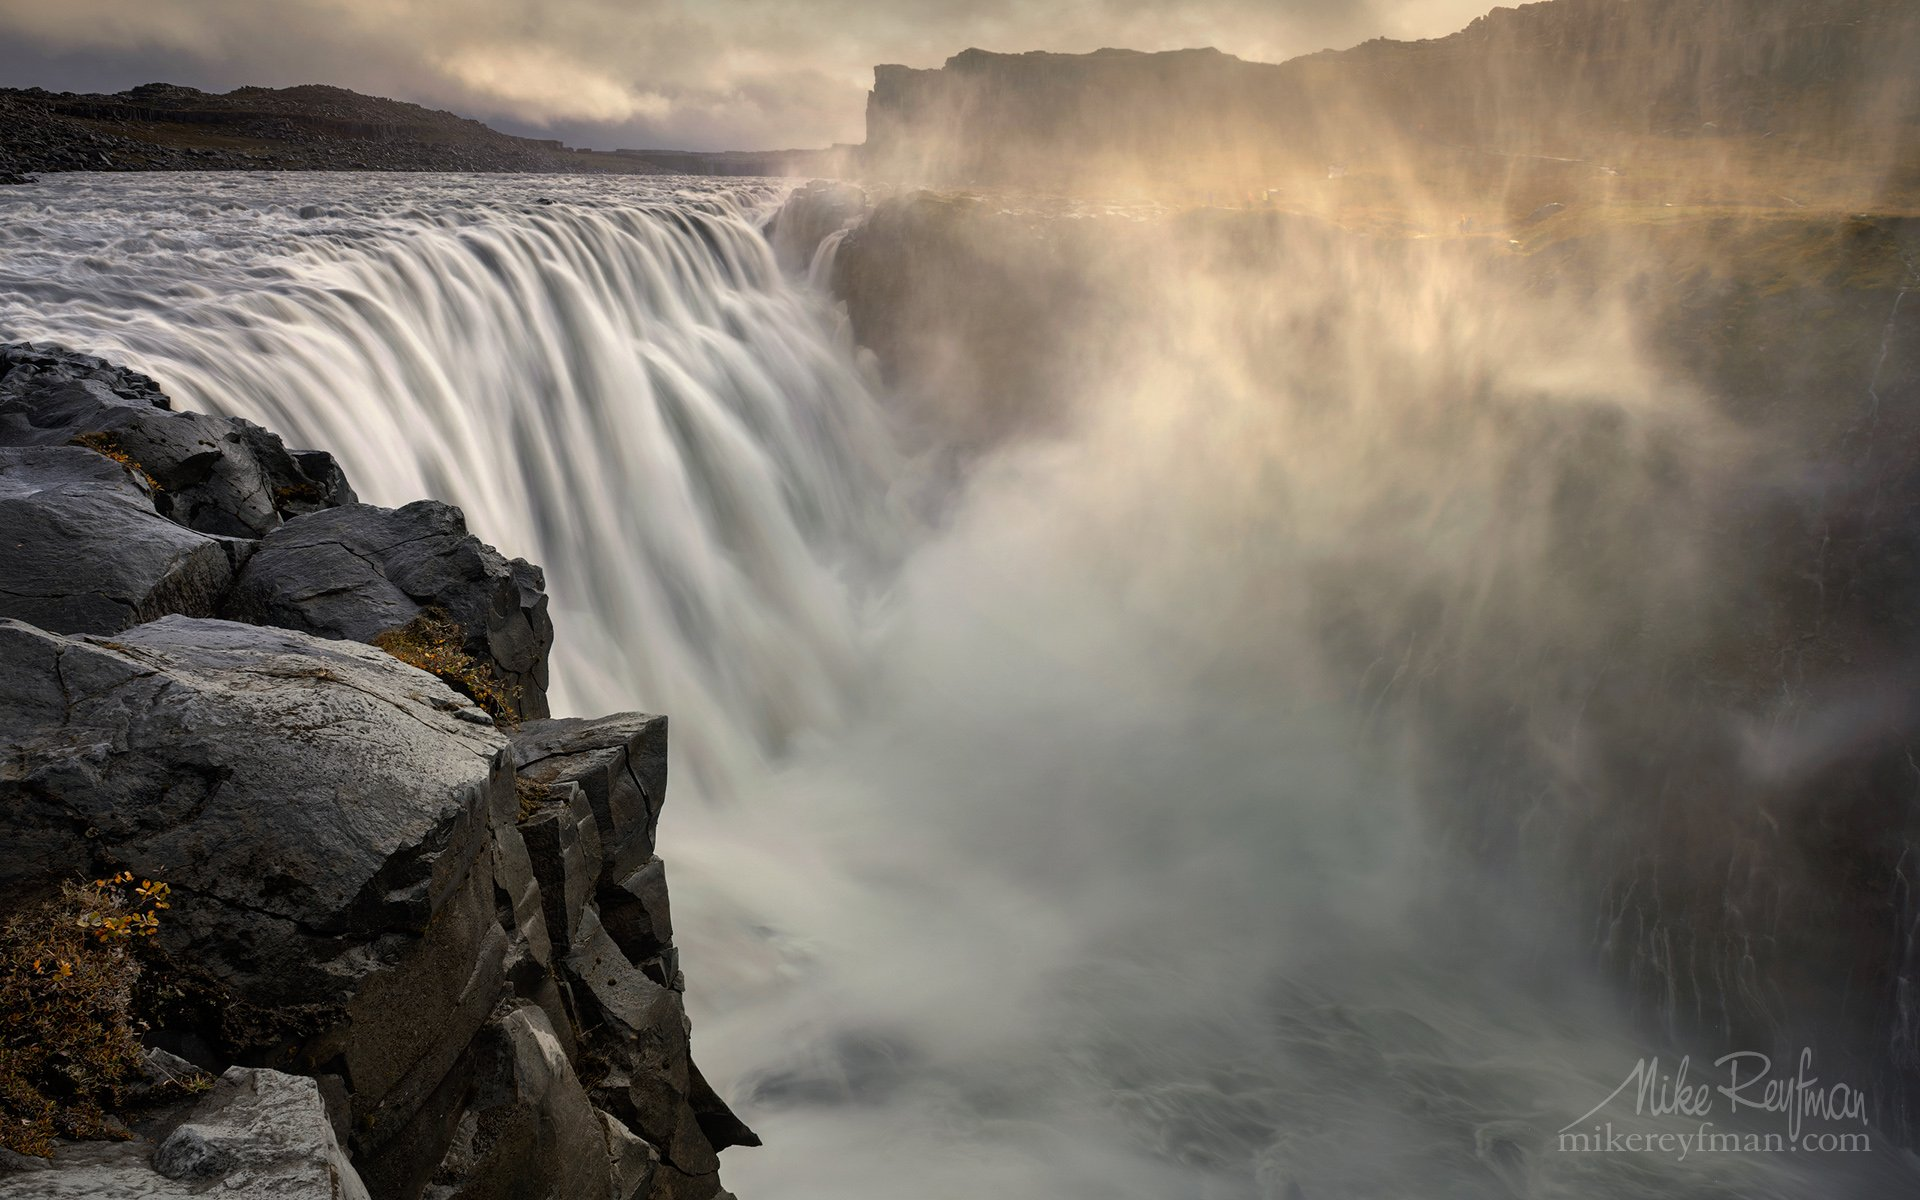 dettifoss, vatnajökull national park, northeast iceland, powerful, waterfall, europe,  jökulsá á fjöllum, river, Майк Рейфман